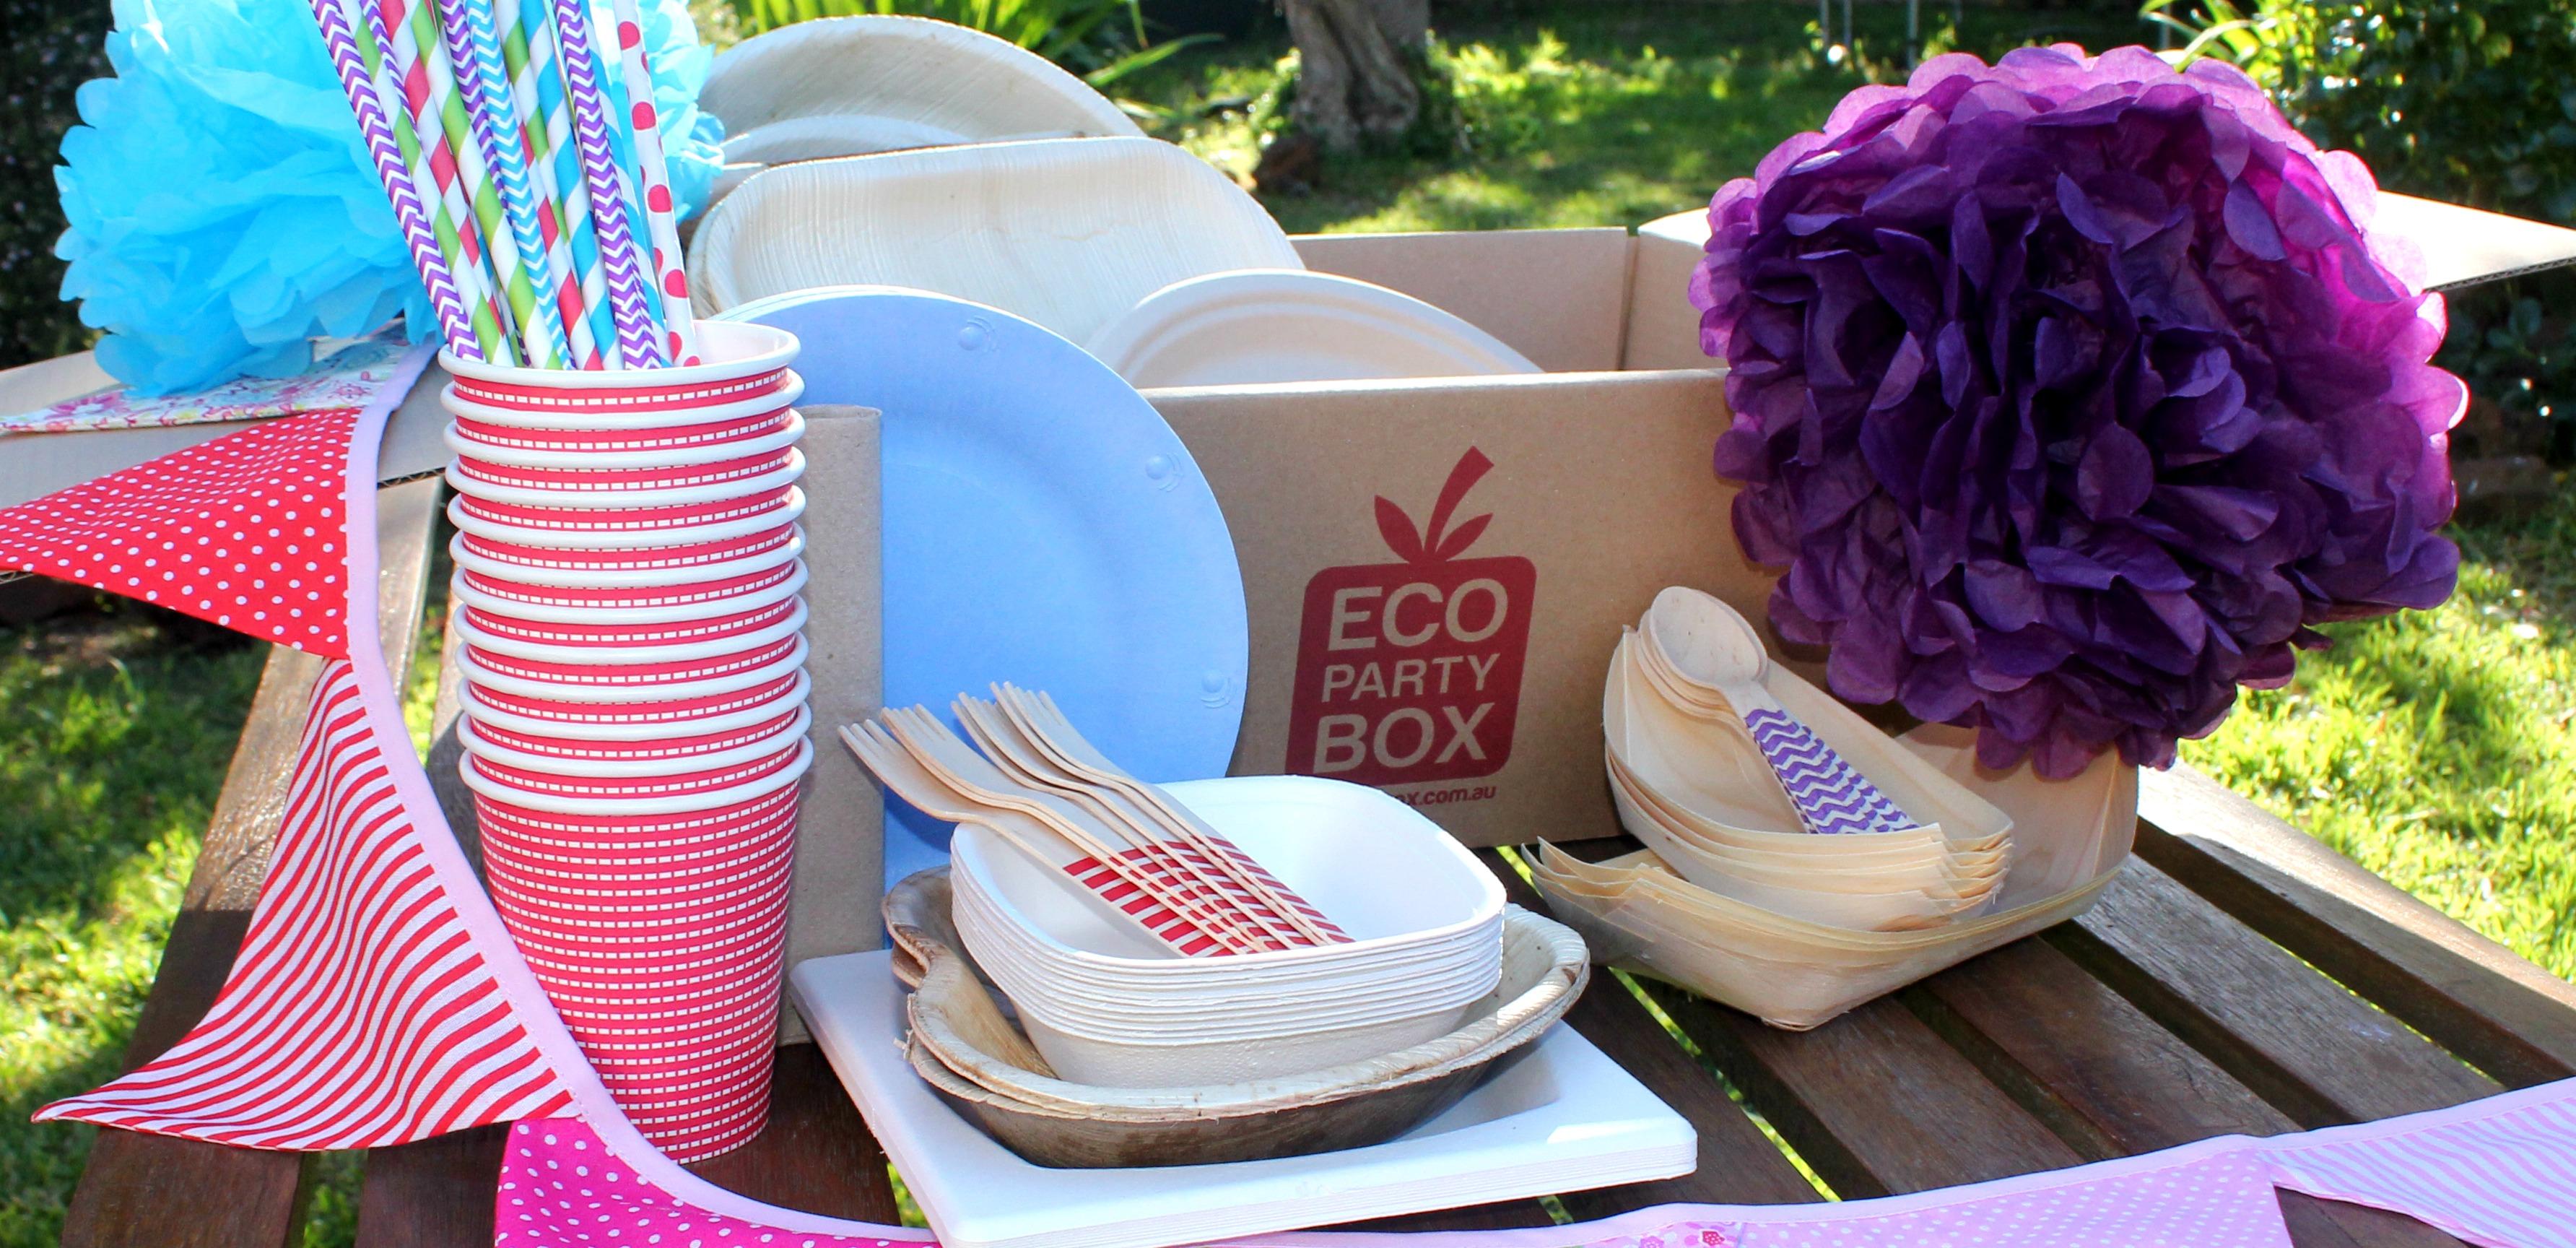 Kids Birthday Party Ideas Adelaide Eco Party ideas